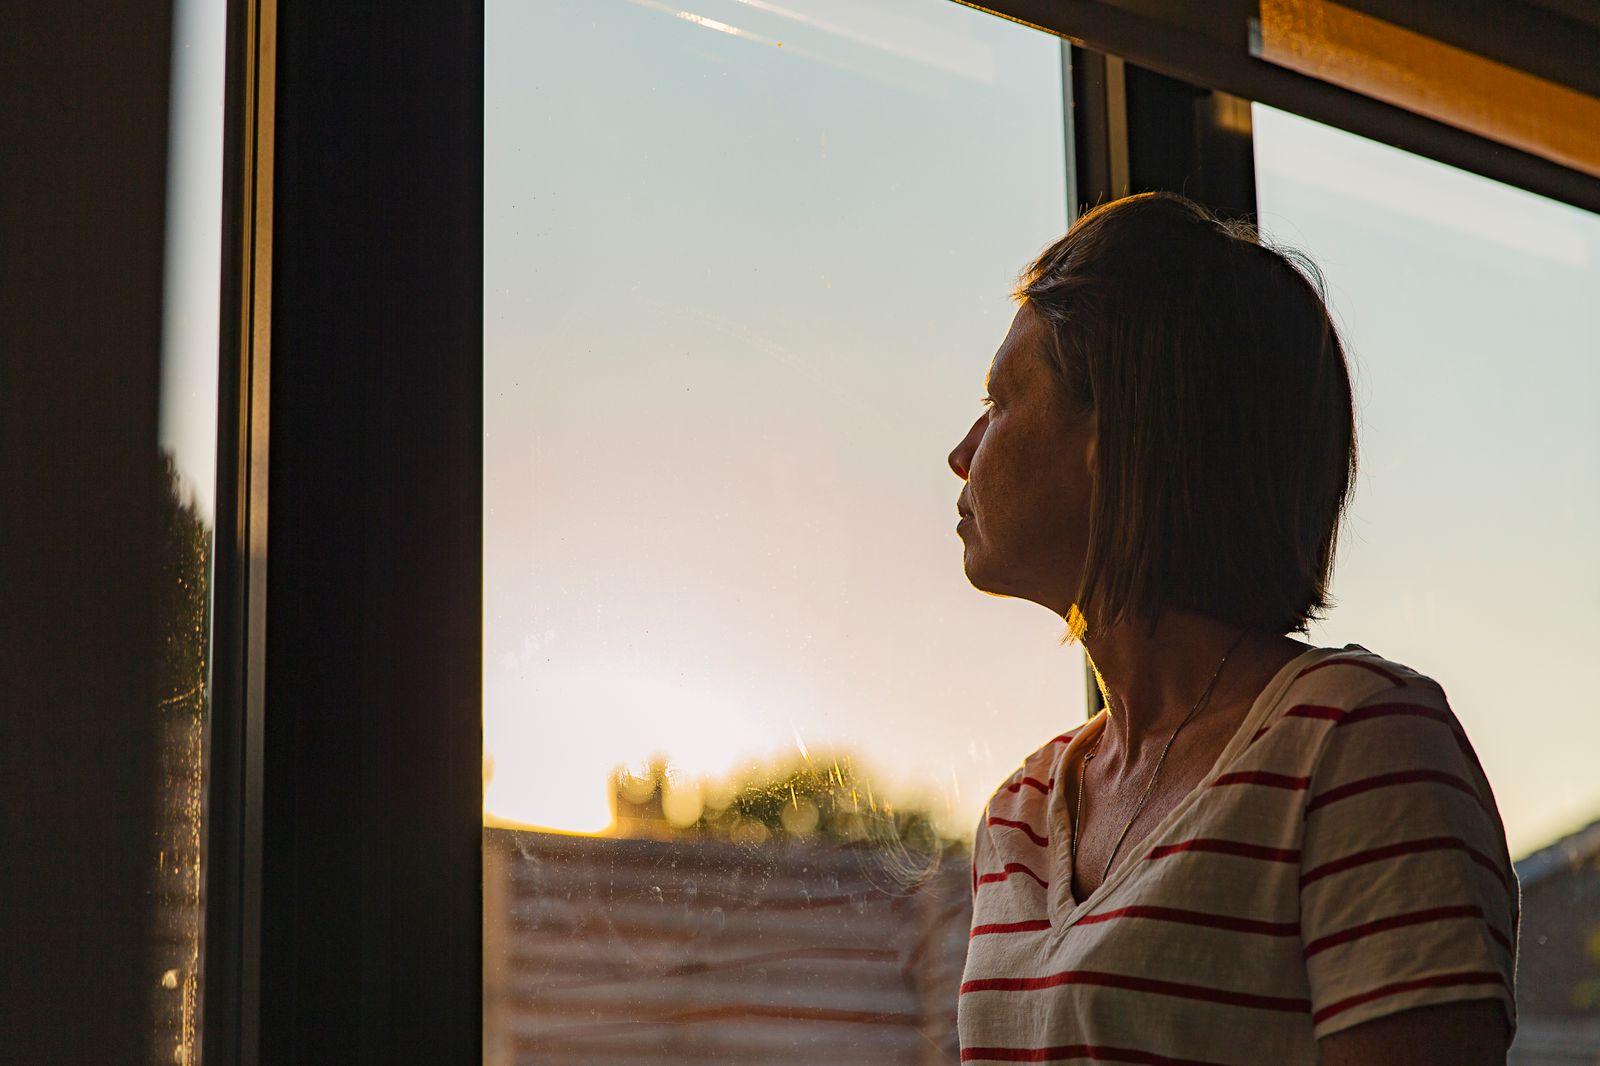 Woman looking through window - negative emotion